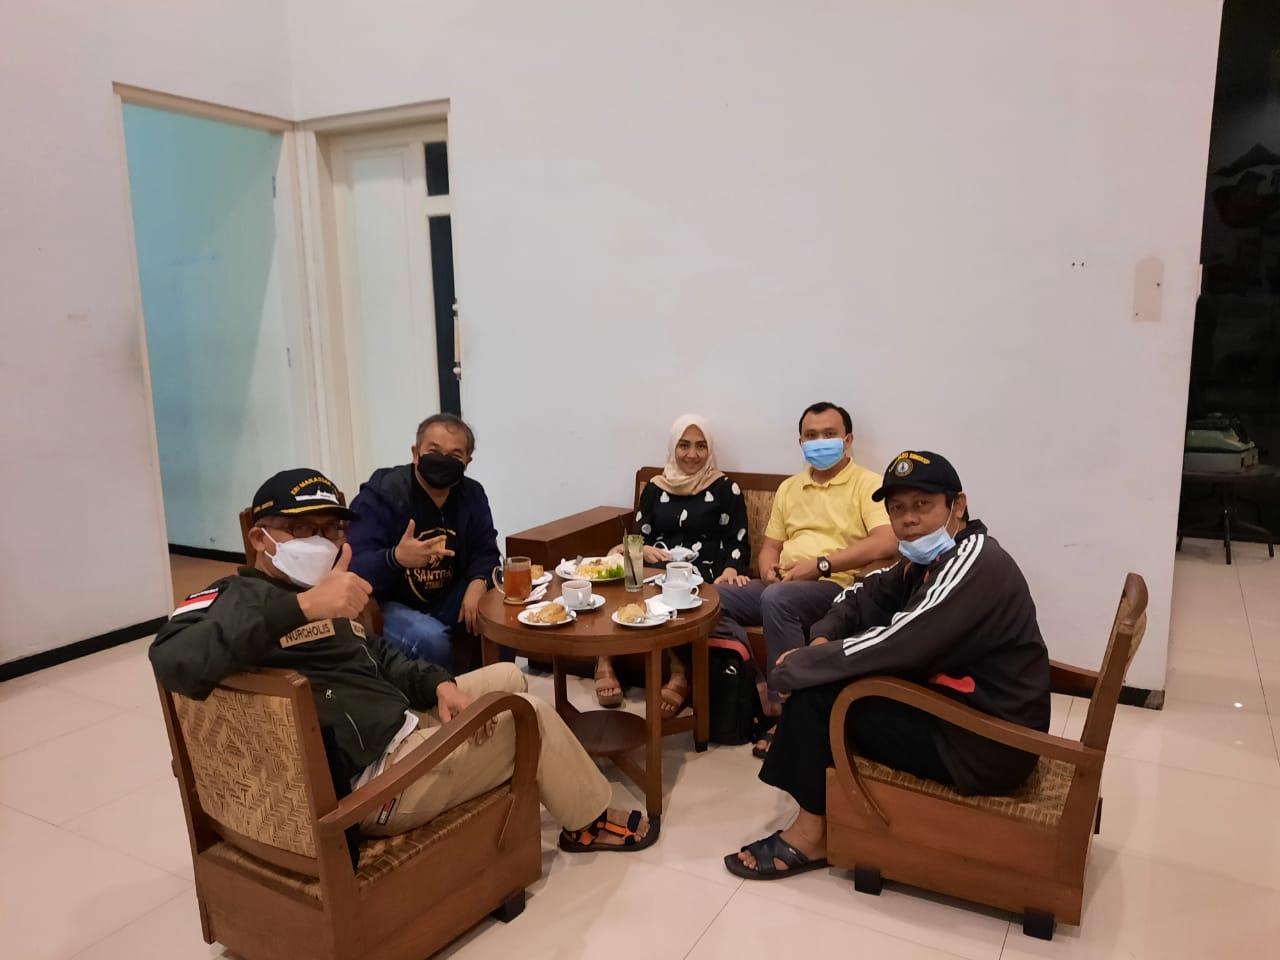 Pakar Komunikasi dan Motivator Nasional, Dr Aqua Dwipayana, bertemu dengan Bupati Cilacap Tatto Suwarto Pamuji. (Foto dok.)